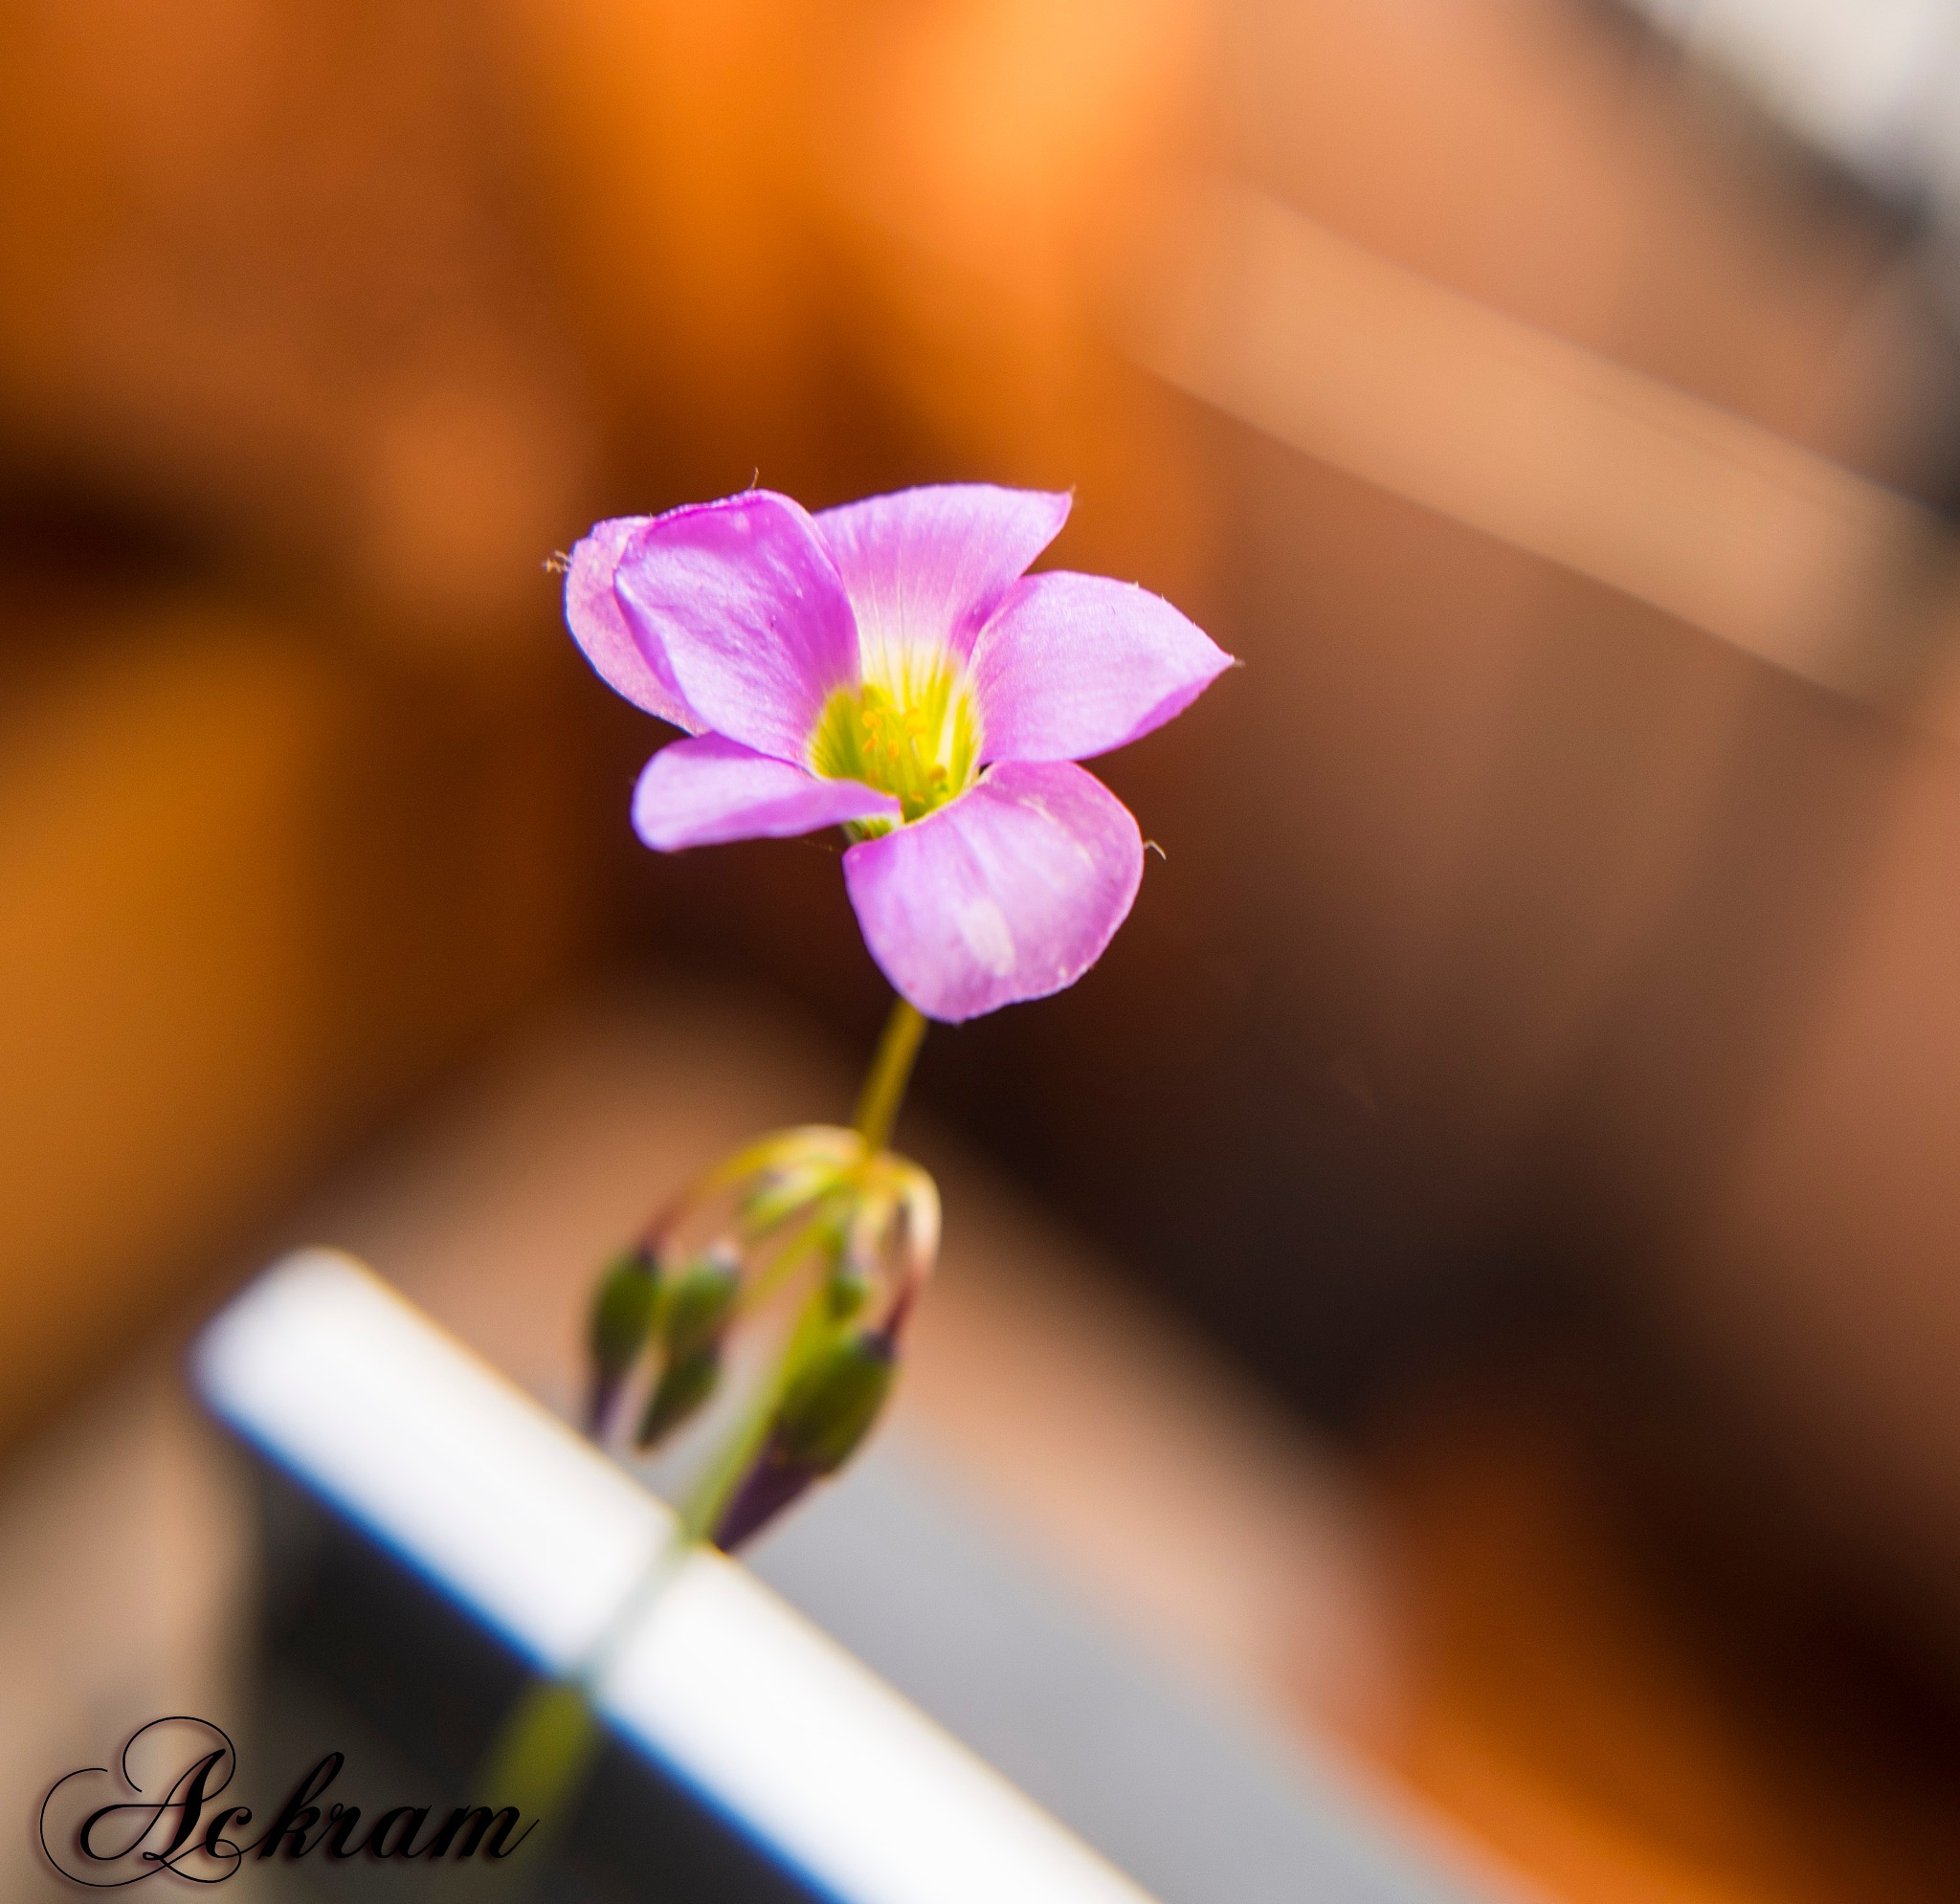 Flowers by Ackram